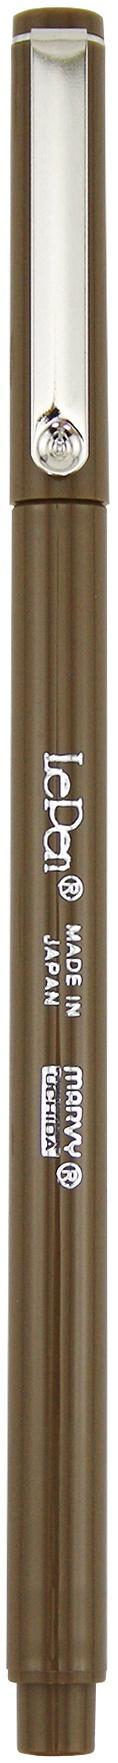 Le Pen .03mm Point Open Stock-Sepia